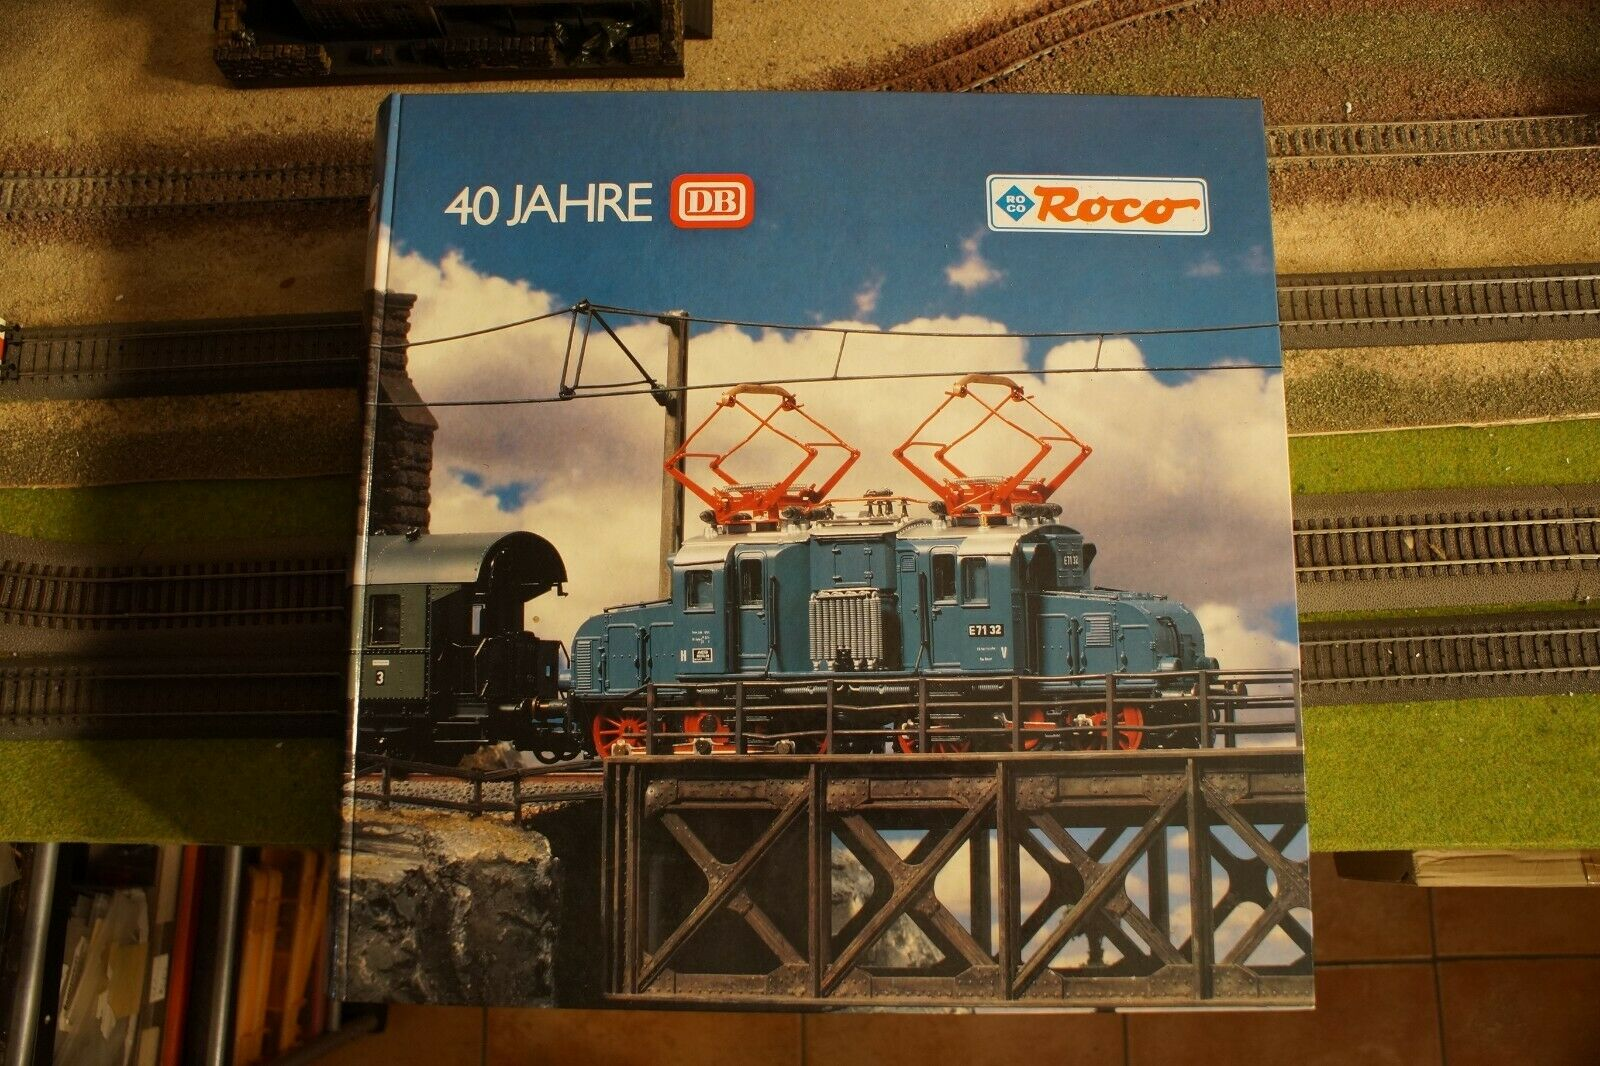 Roco 43031, motor eléctrico E71032, Conjunto de tren de colección, escala Ho